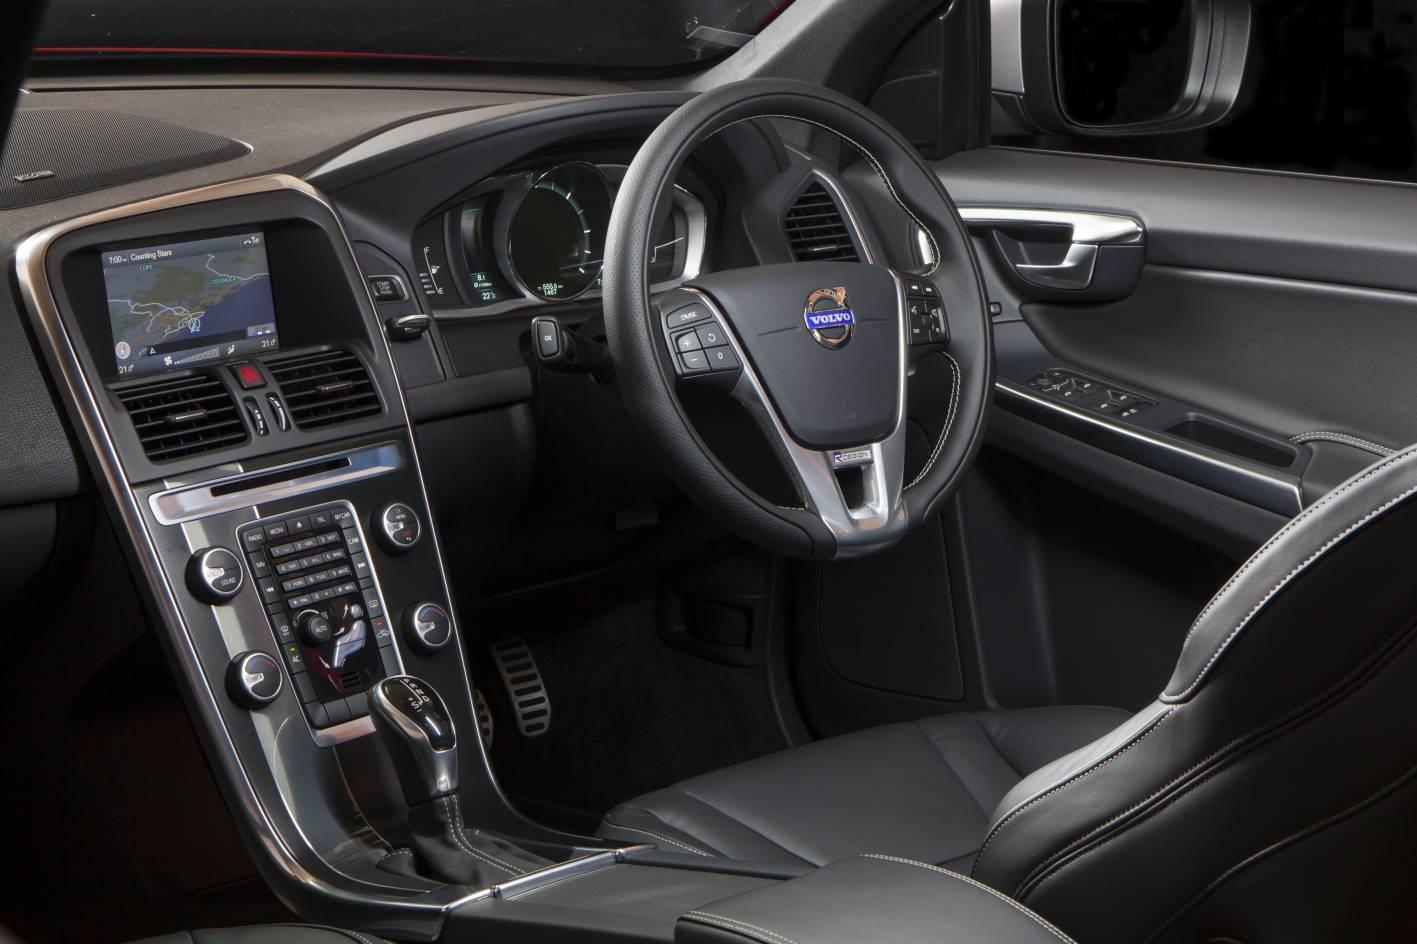 Volvo Xc Interior on New Volvo Diesel Engines